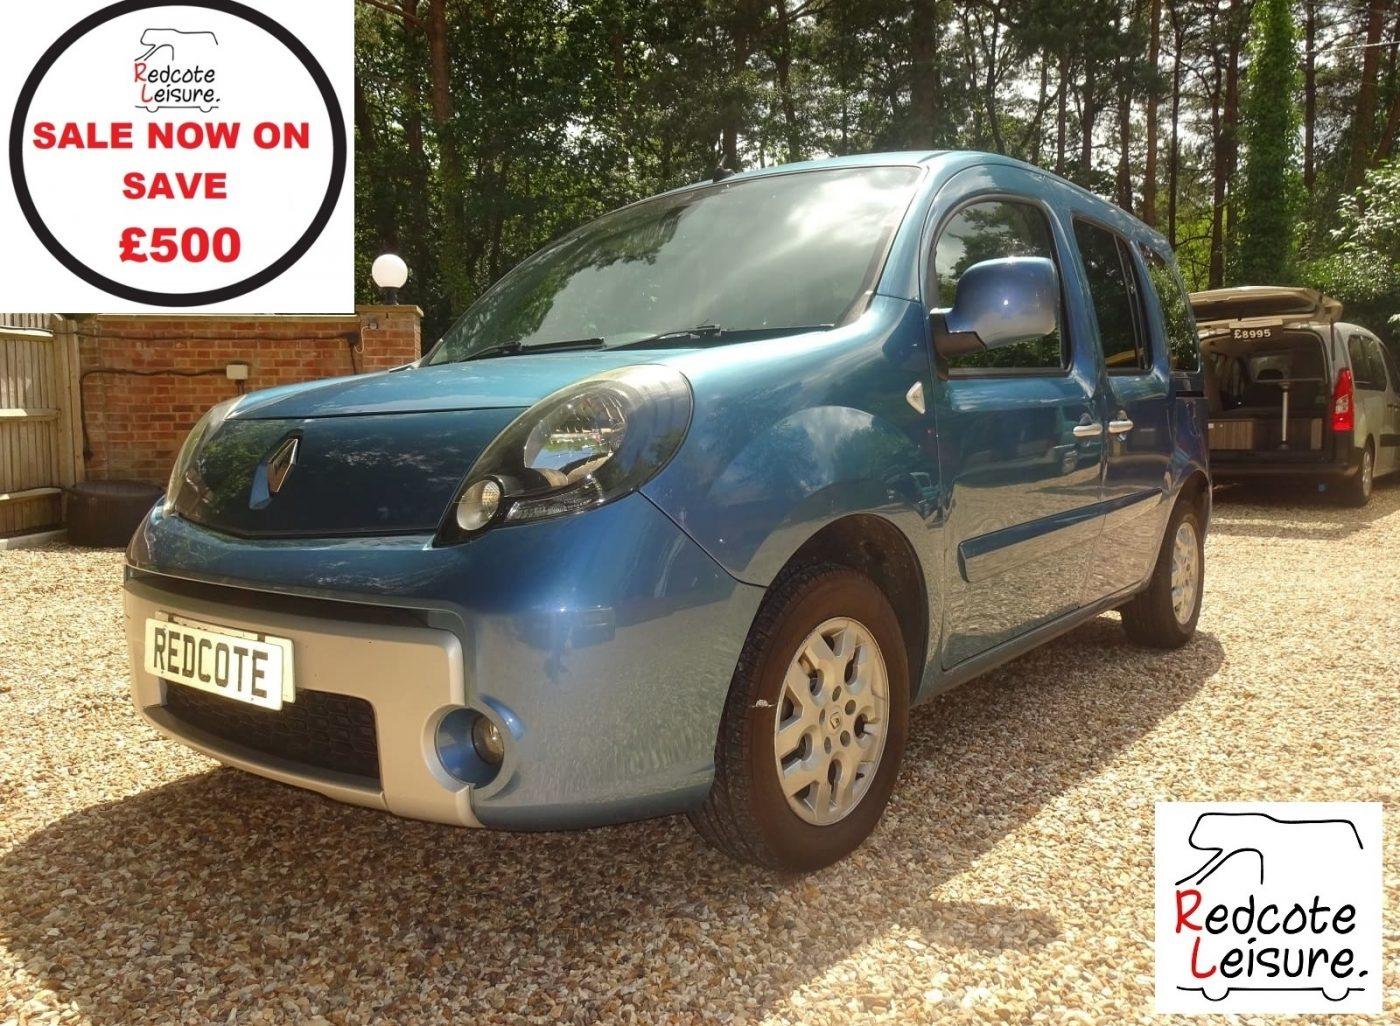 2011 Renault Kangoo Dynamique Micro Camper SALE £500